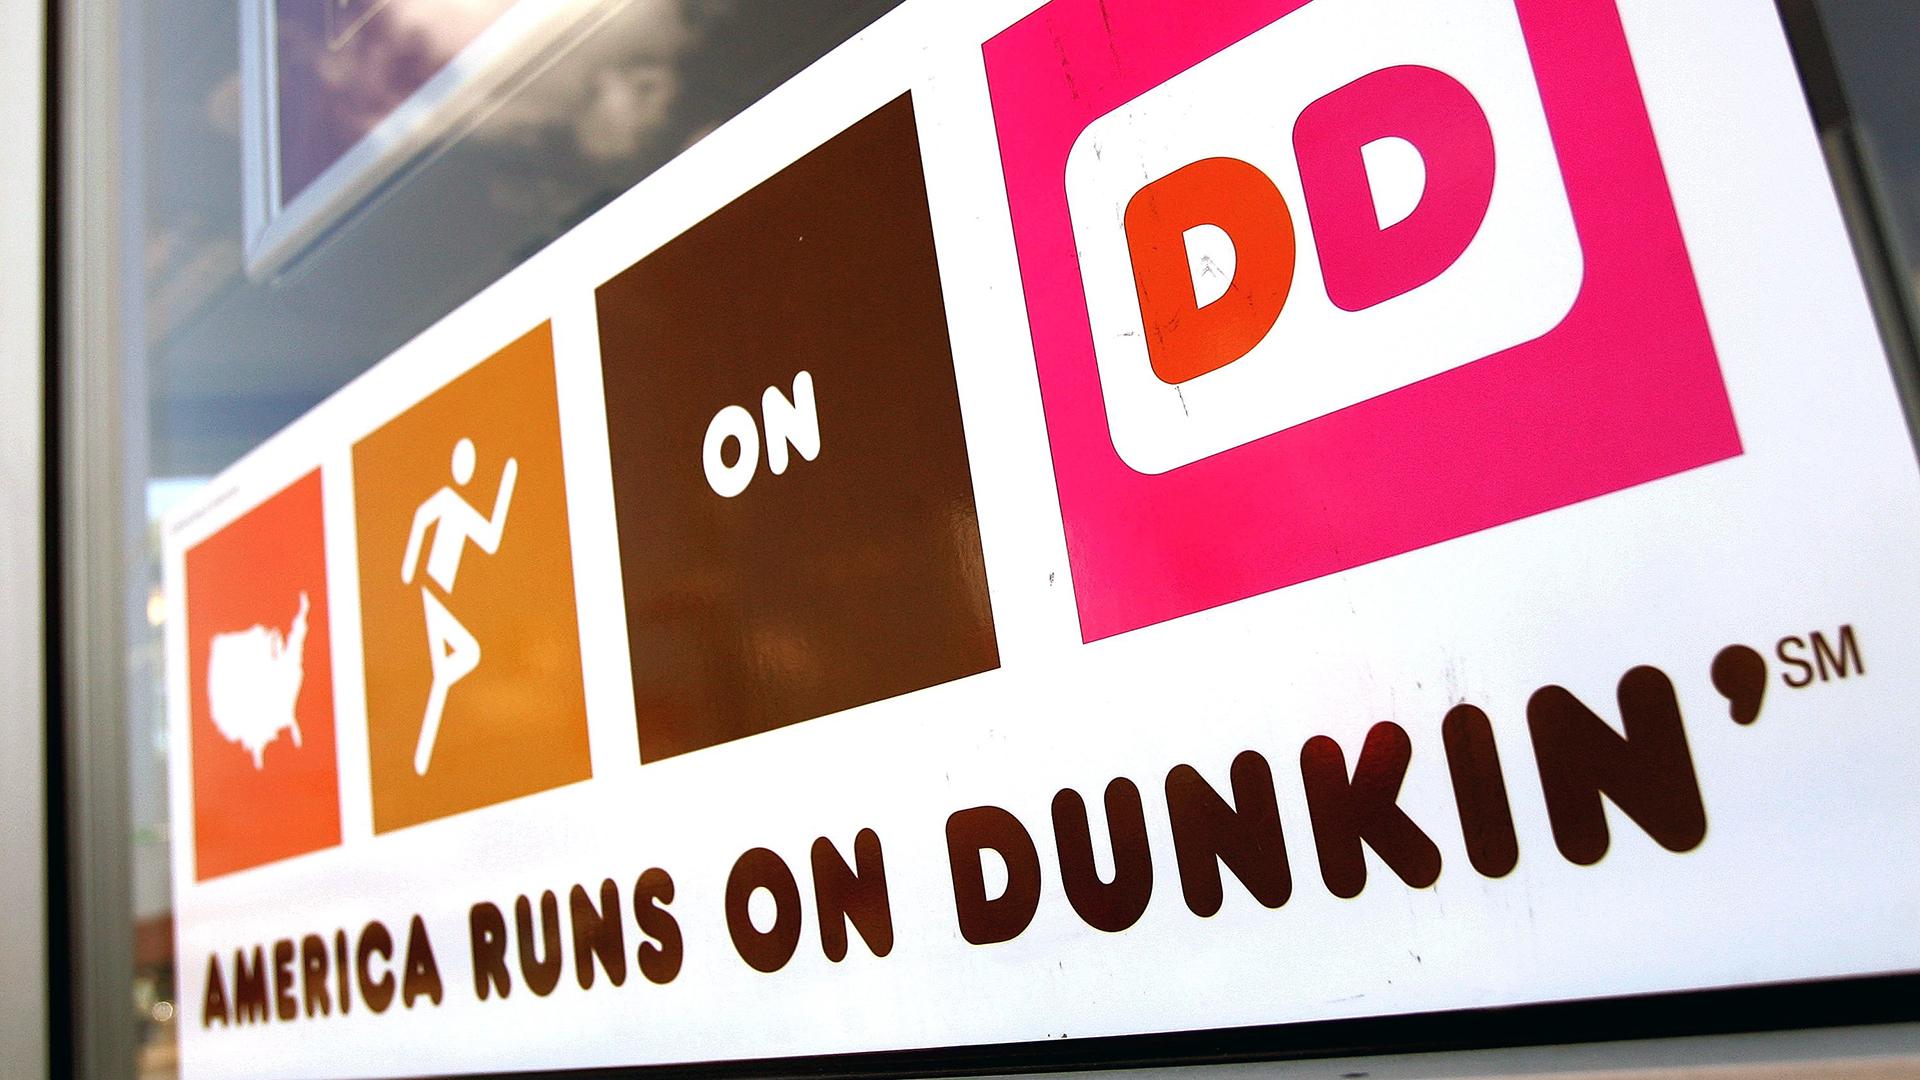 America Runs on Dunkin Donuts sign-159532.jpg31114855